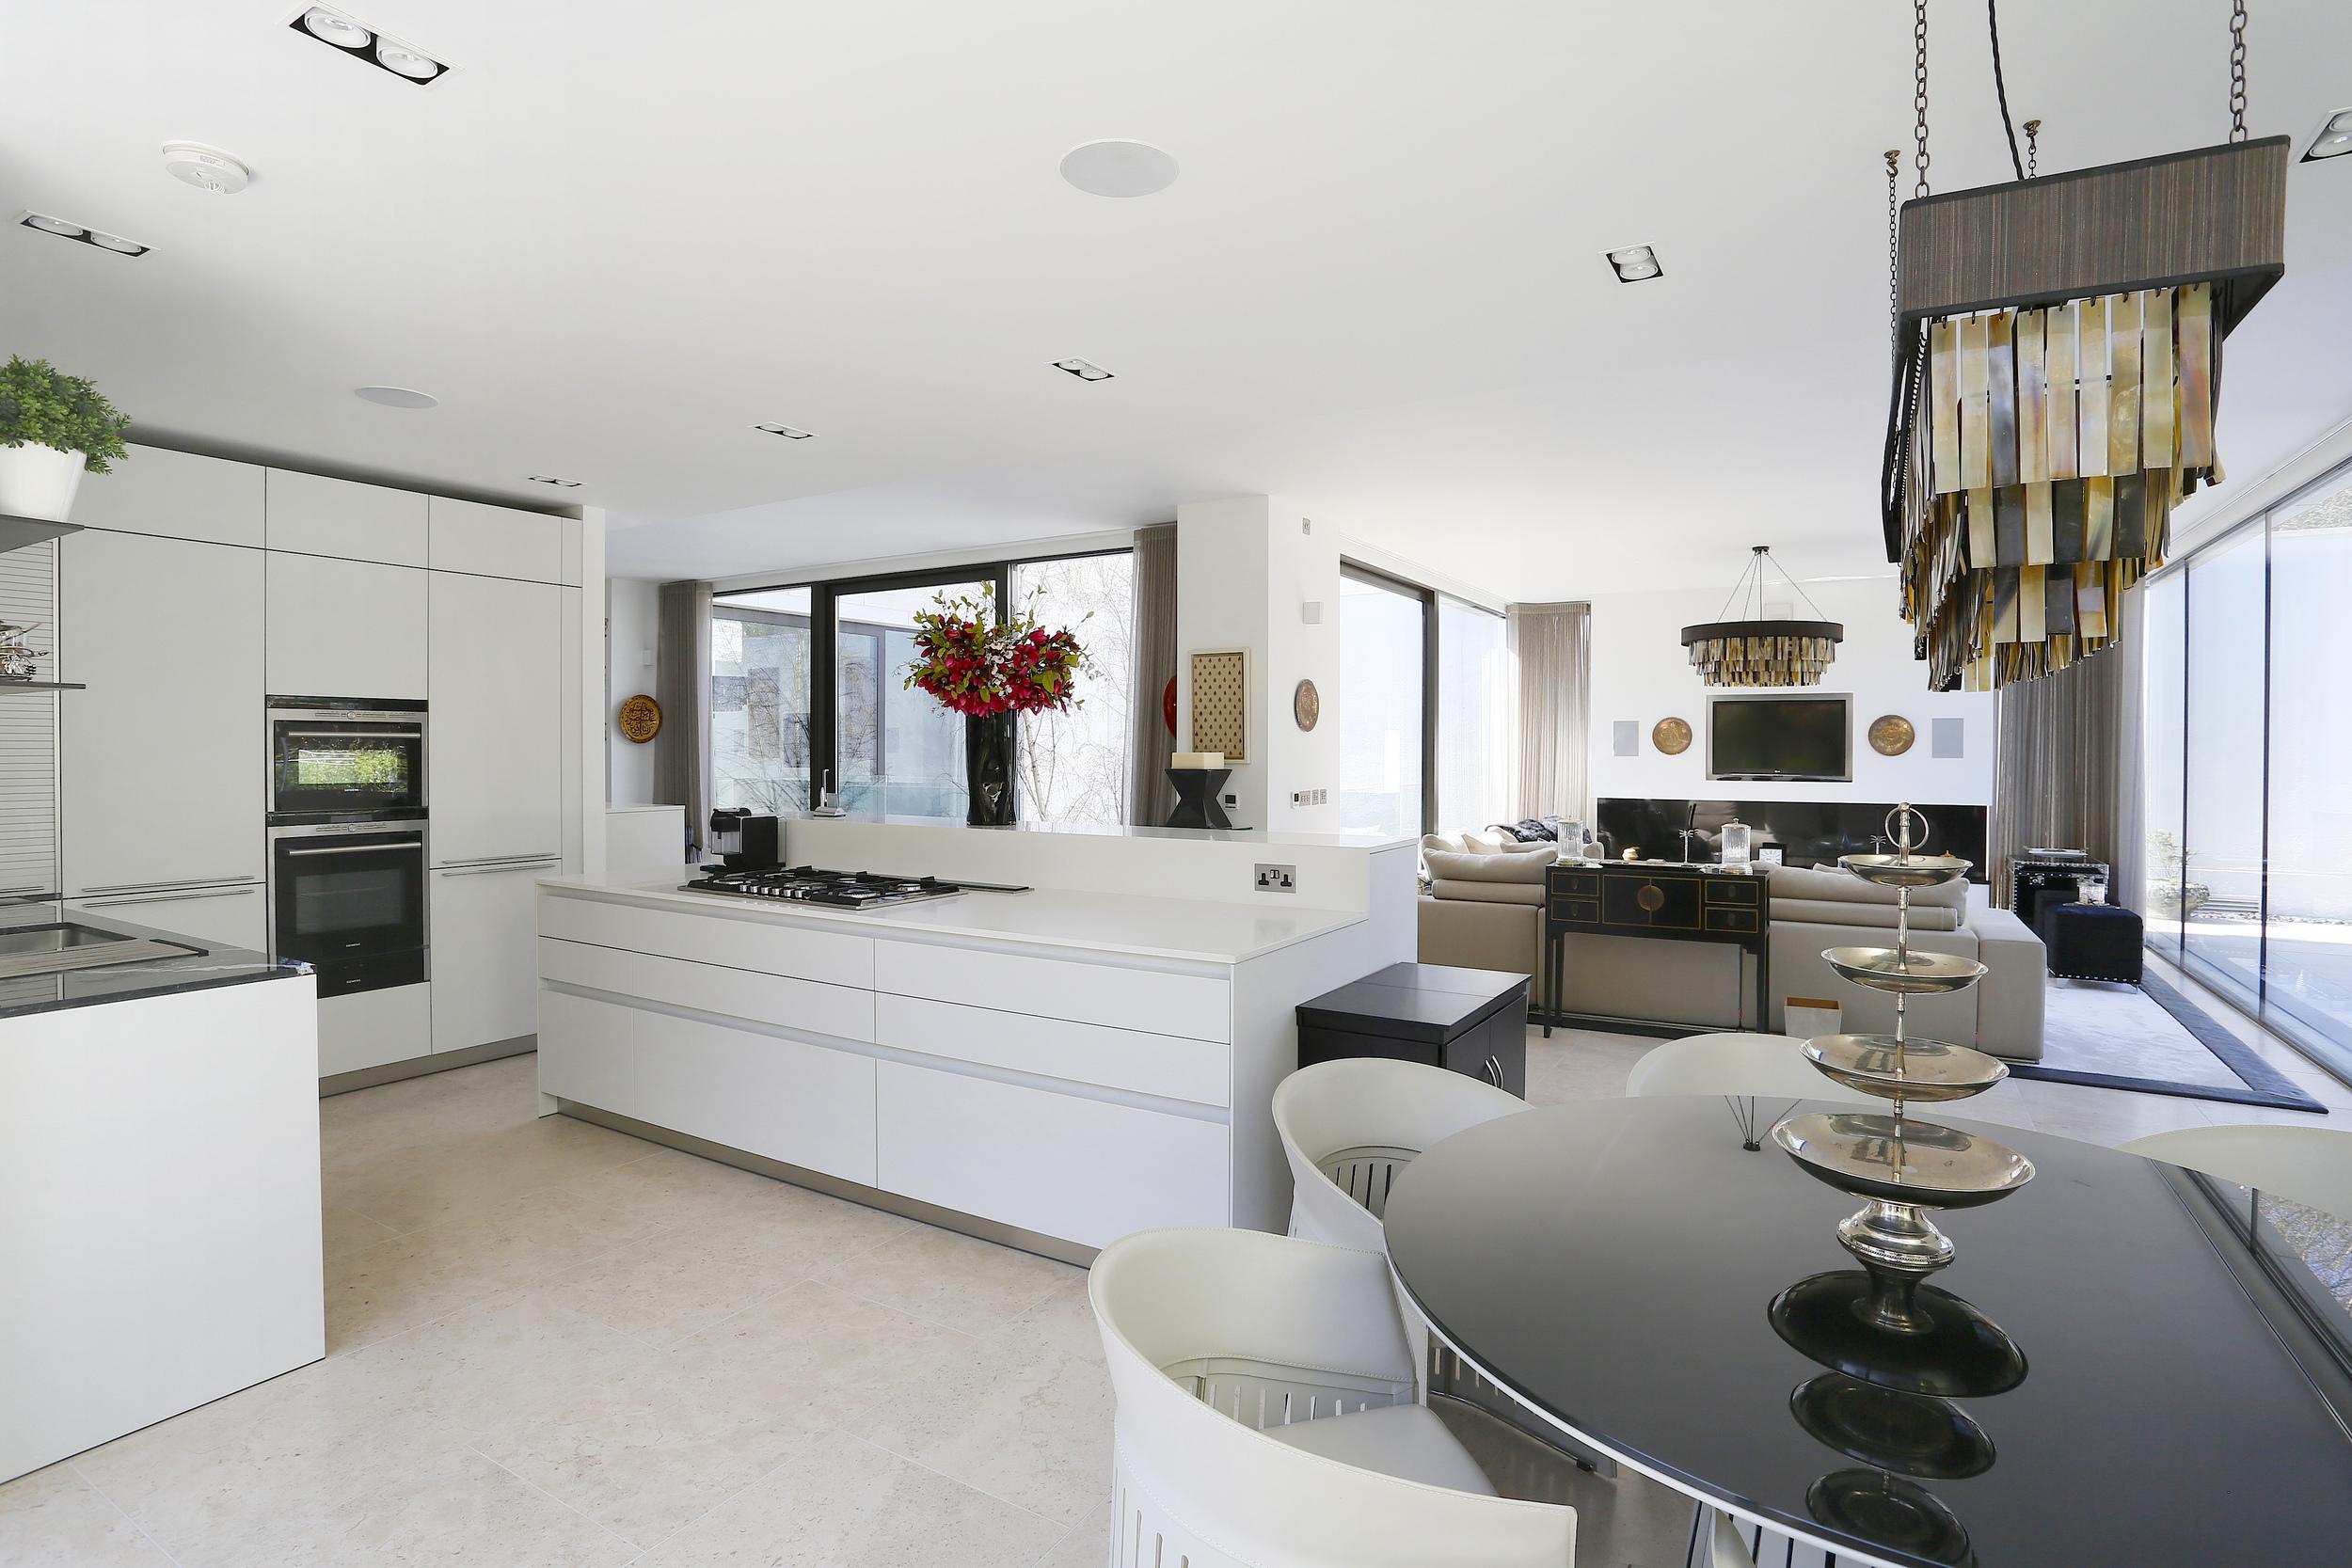 Amoula Hse - Kitchen.jpg